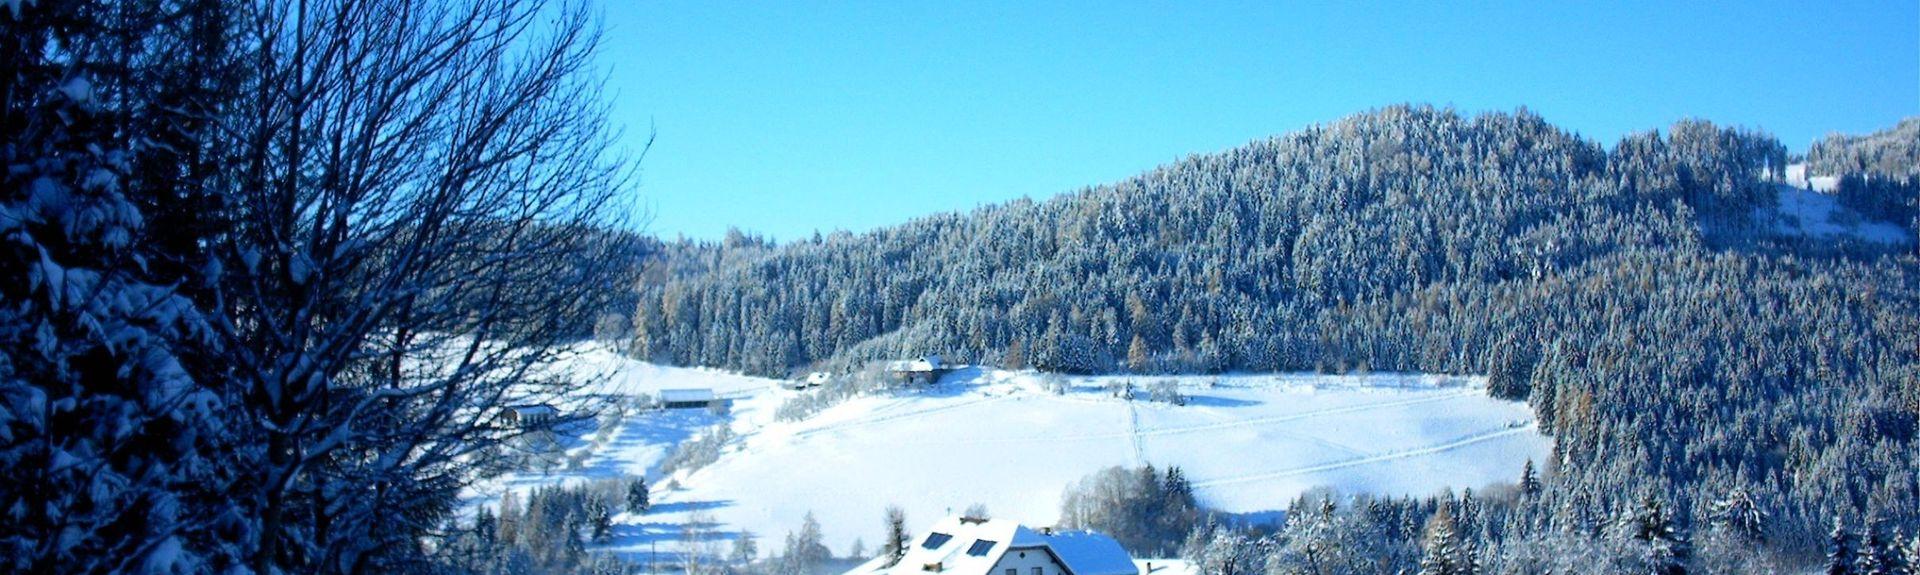 Eberndorf, Carinthia, Austria